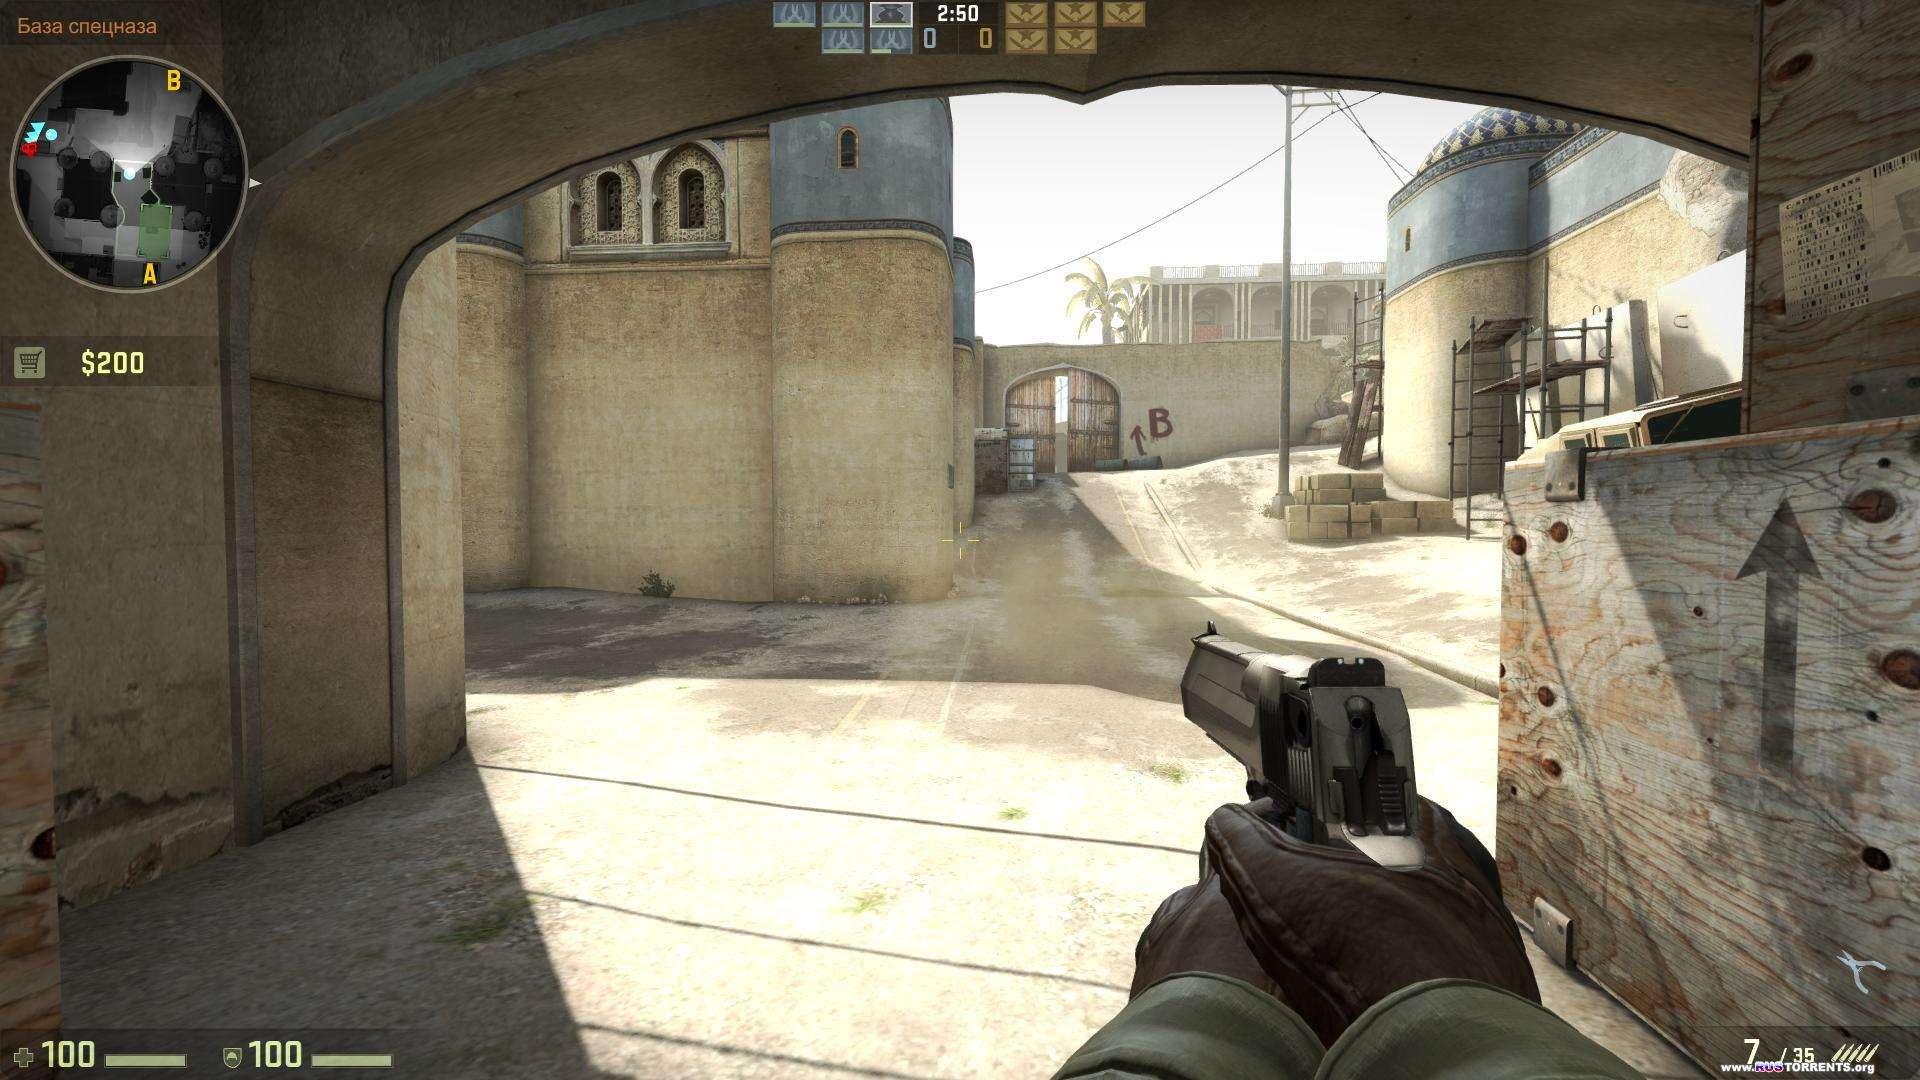 Counter-Strike: Global Offensive [v1.35.6.4] | PC | RePack